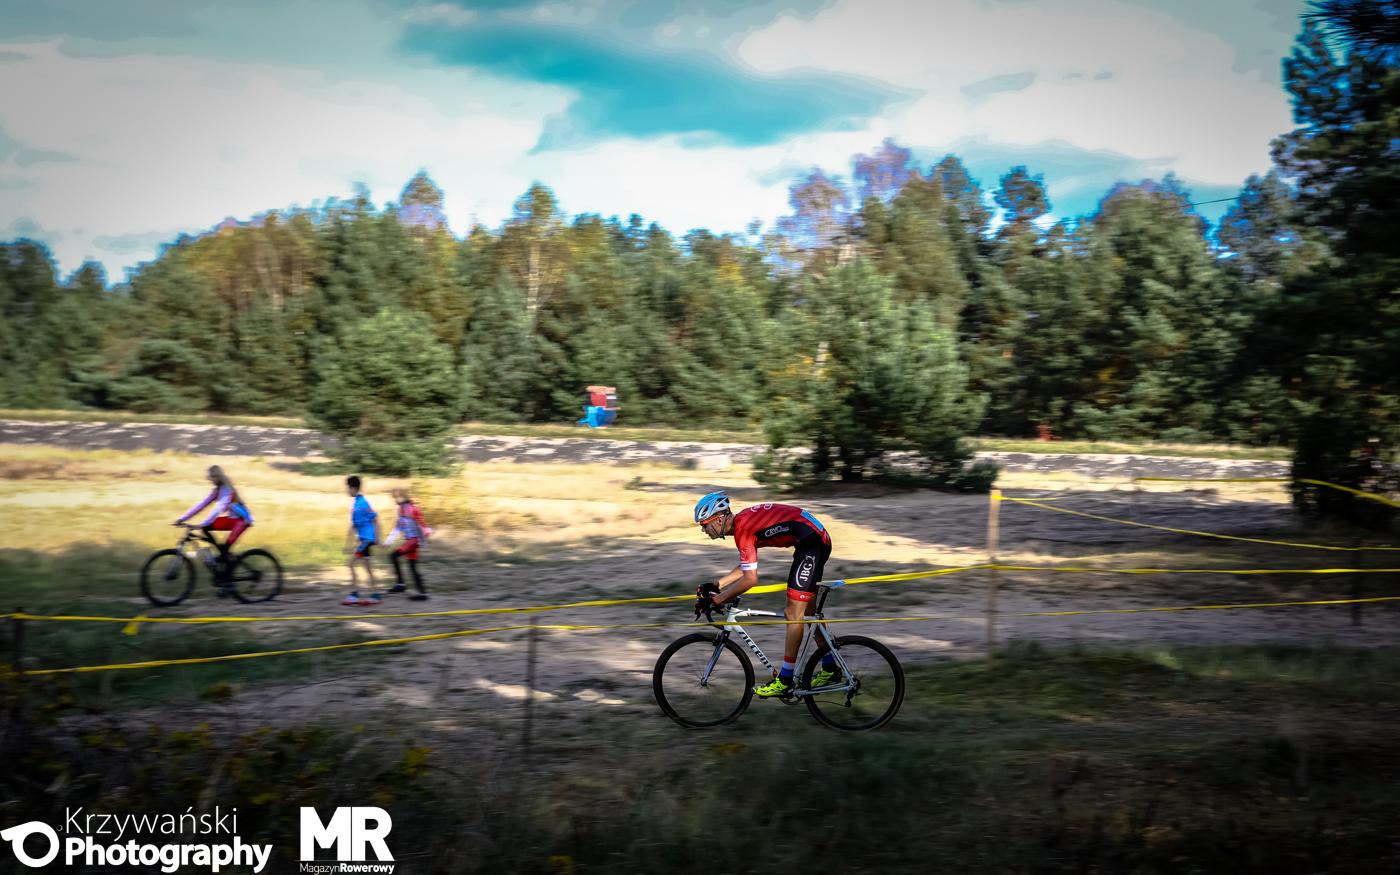 http://magazynrowerowy.pl/logmein/wp-content/uploads/2017/10/CX_Maslonskie_1140.jpg